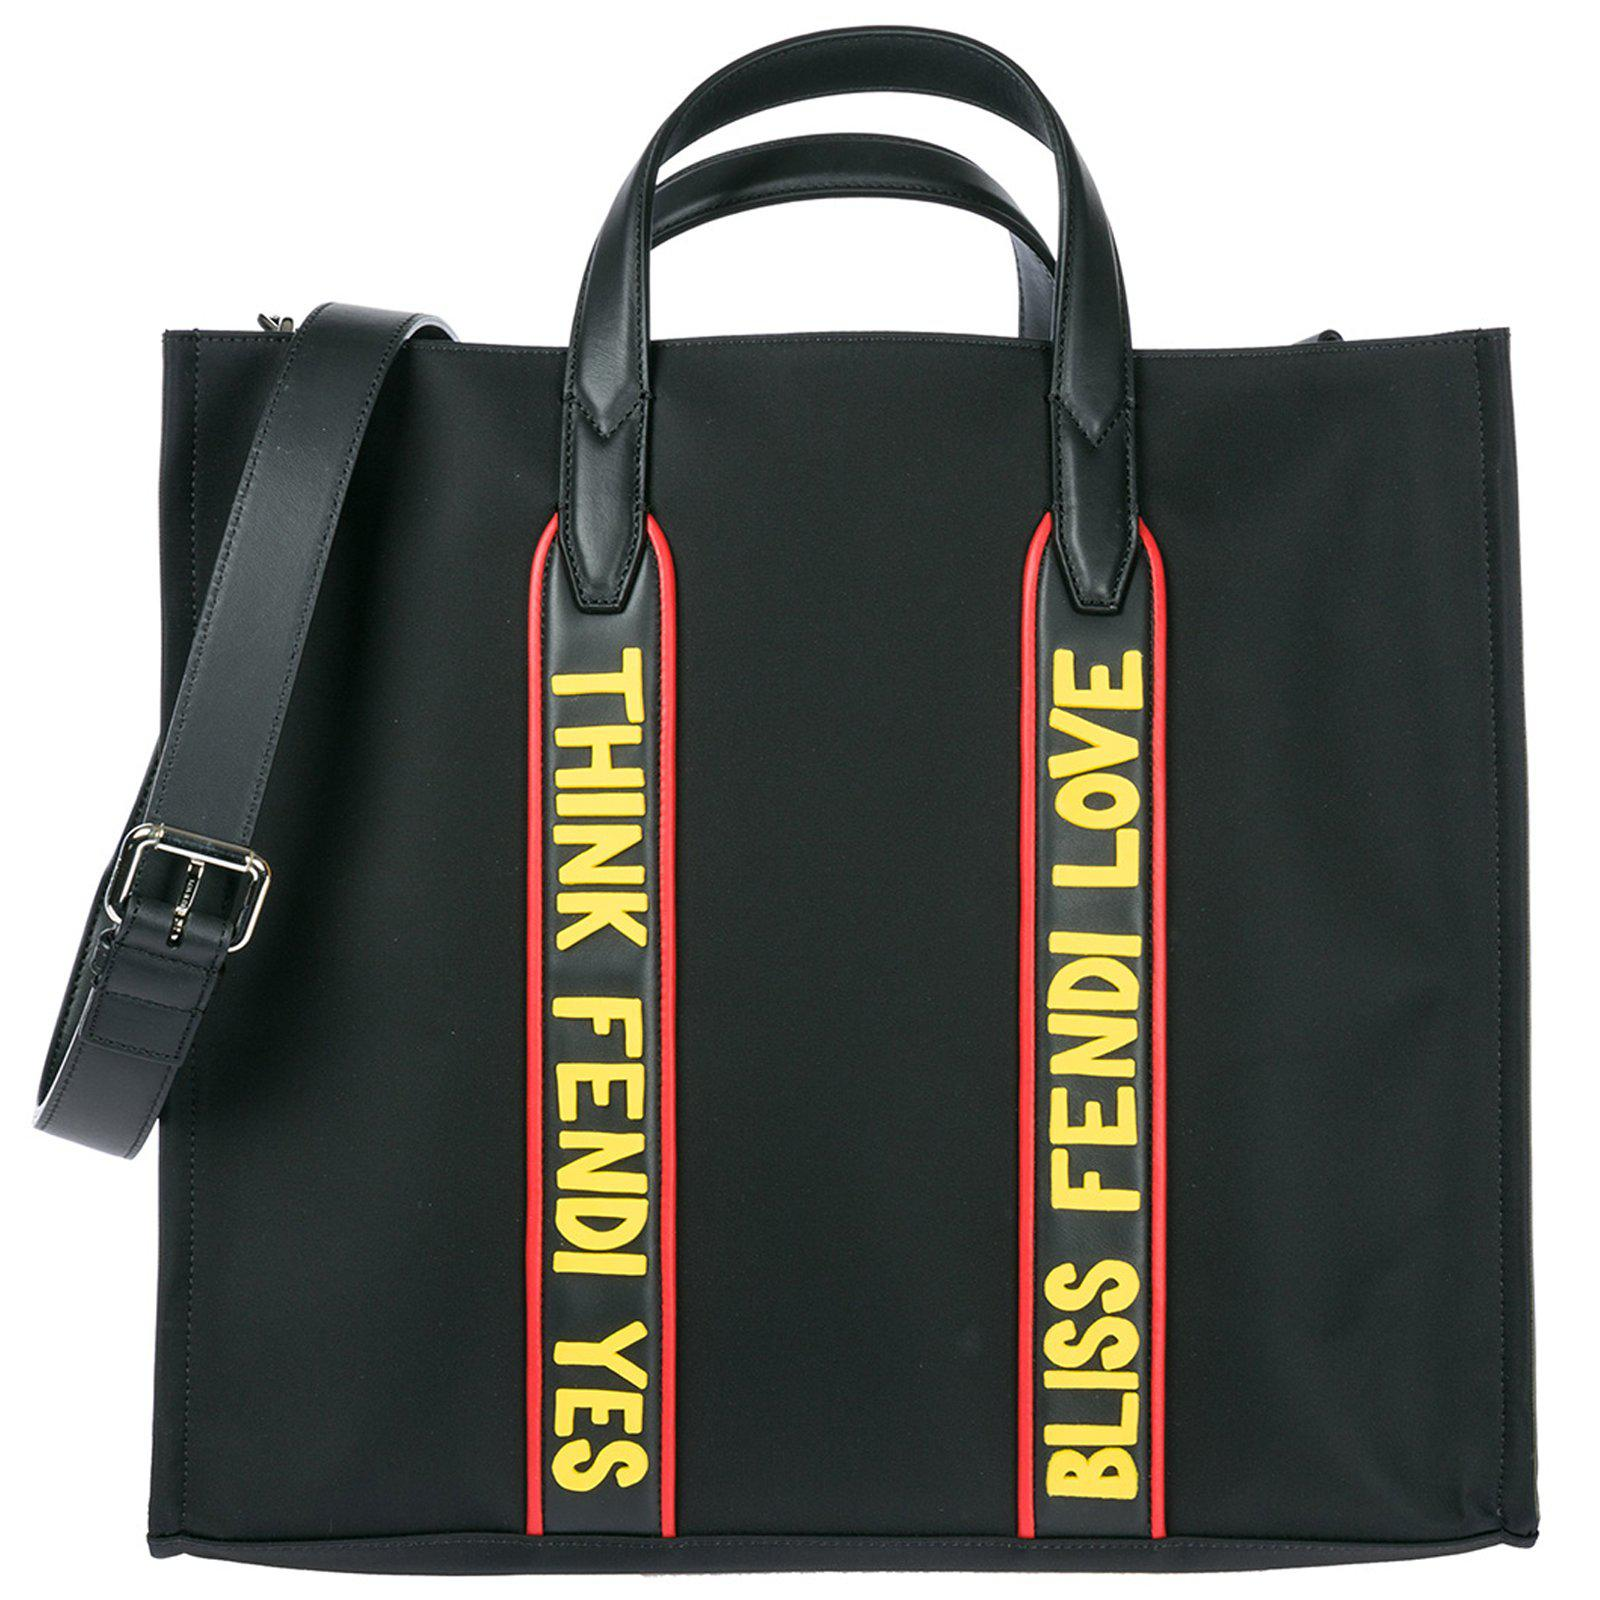 dface3630171 Lyst - Fendi Logo Tote Bag in Black for Men best website 7a91e ebc33 ...